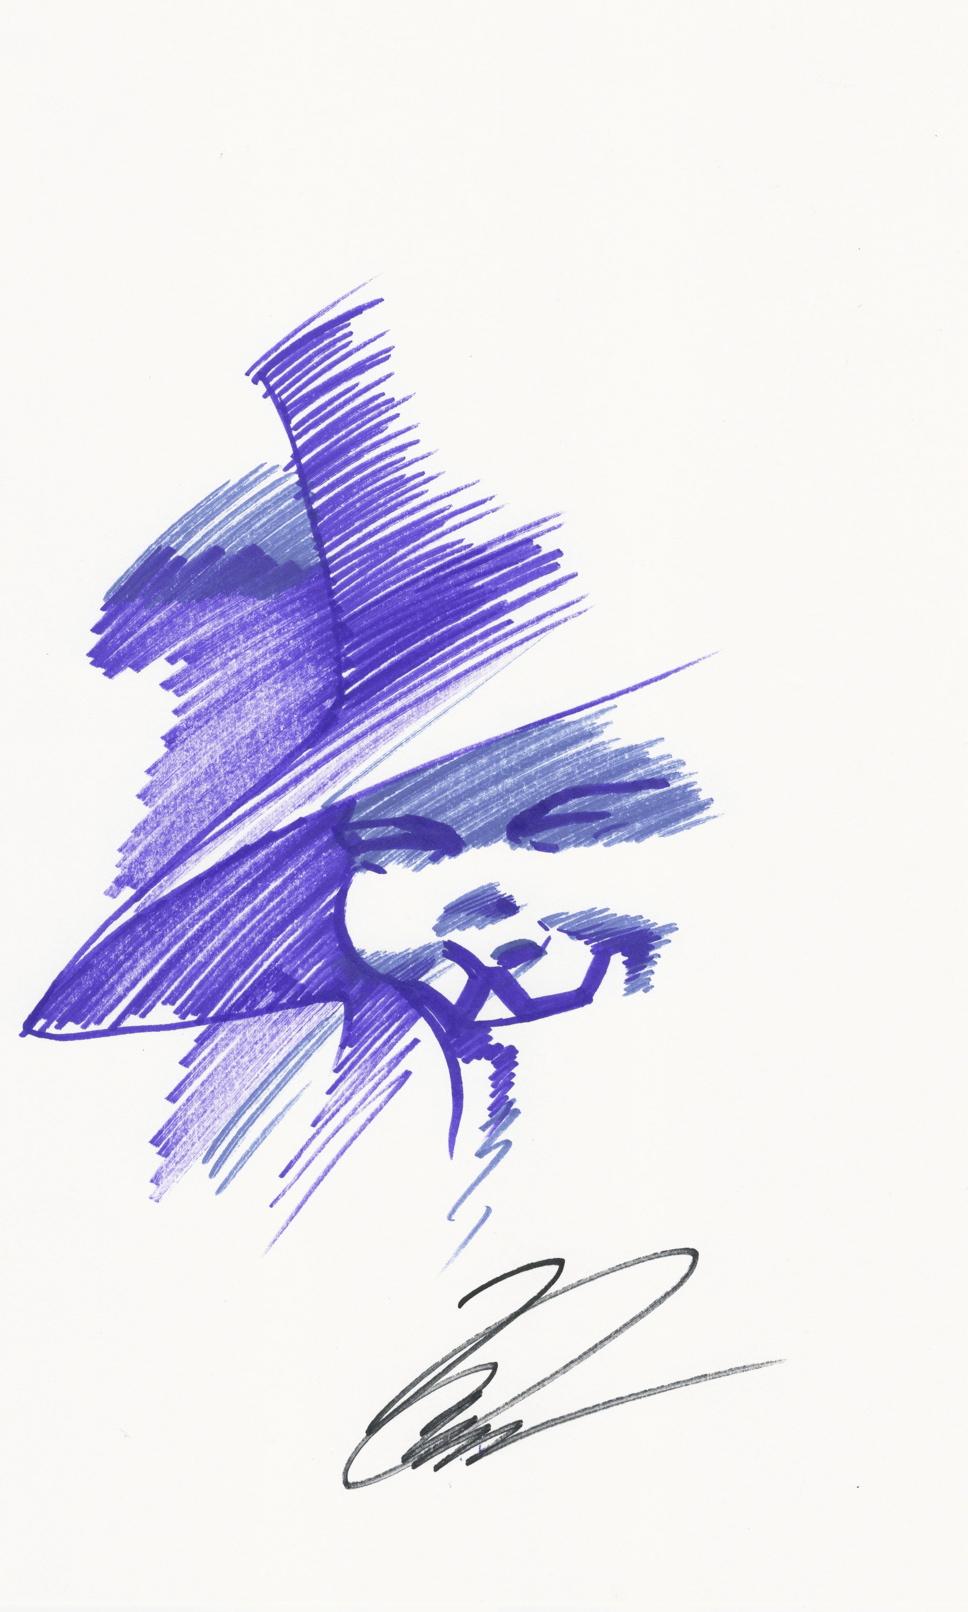 v-for-vendetta-original-david-lloyd-comic-art-sketch-alan-moore-1